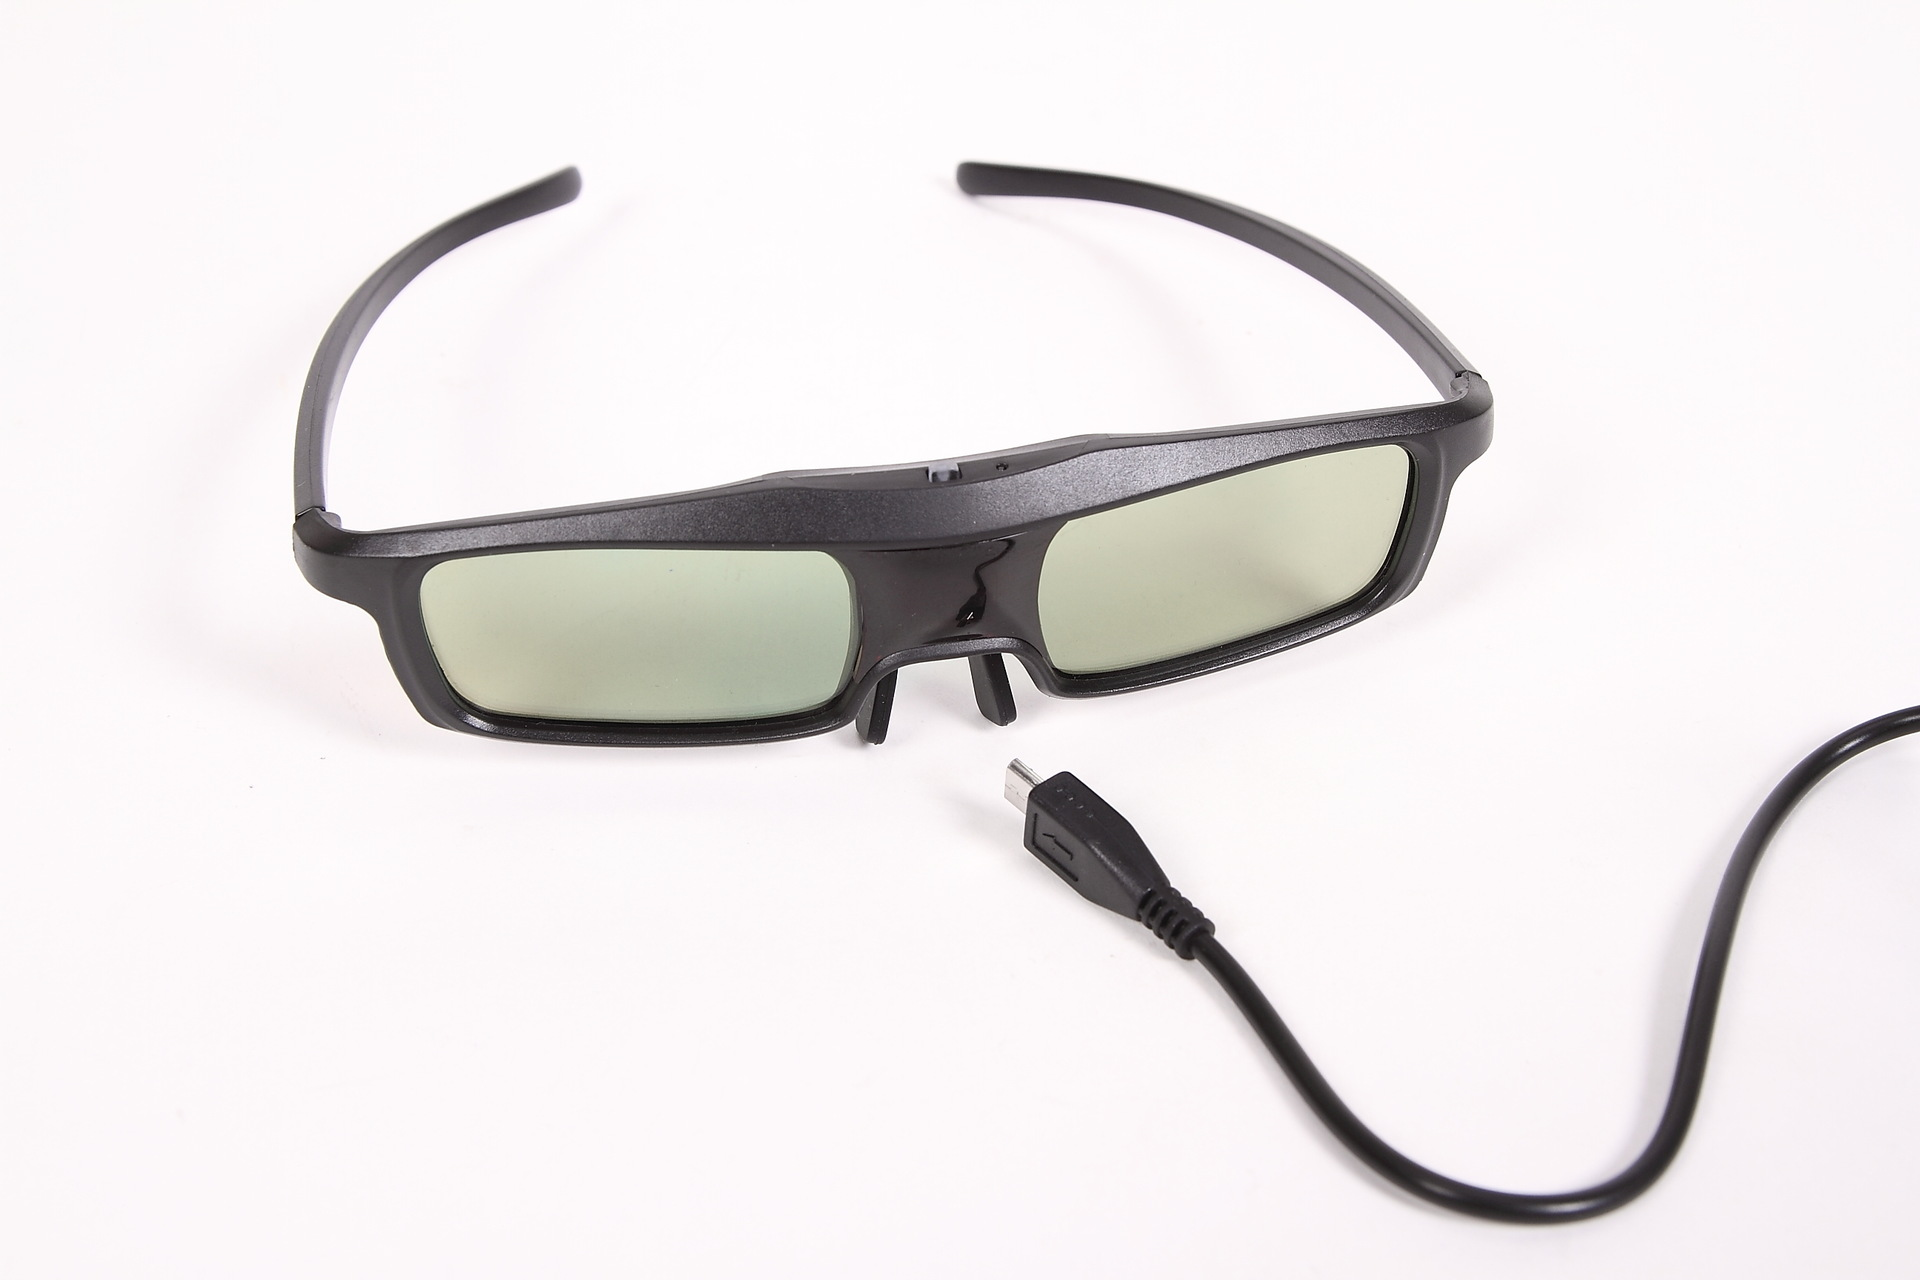 【TV视频3D快门夏普东芝三星LG索尼飞利浦眼镜max教程框小米带图片